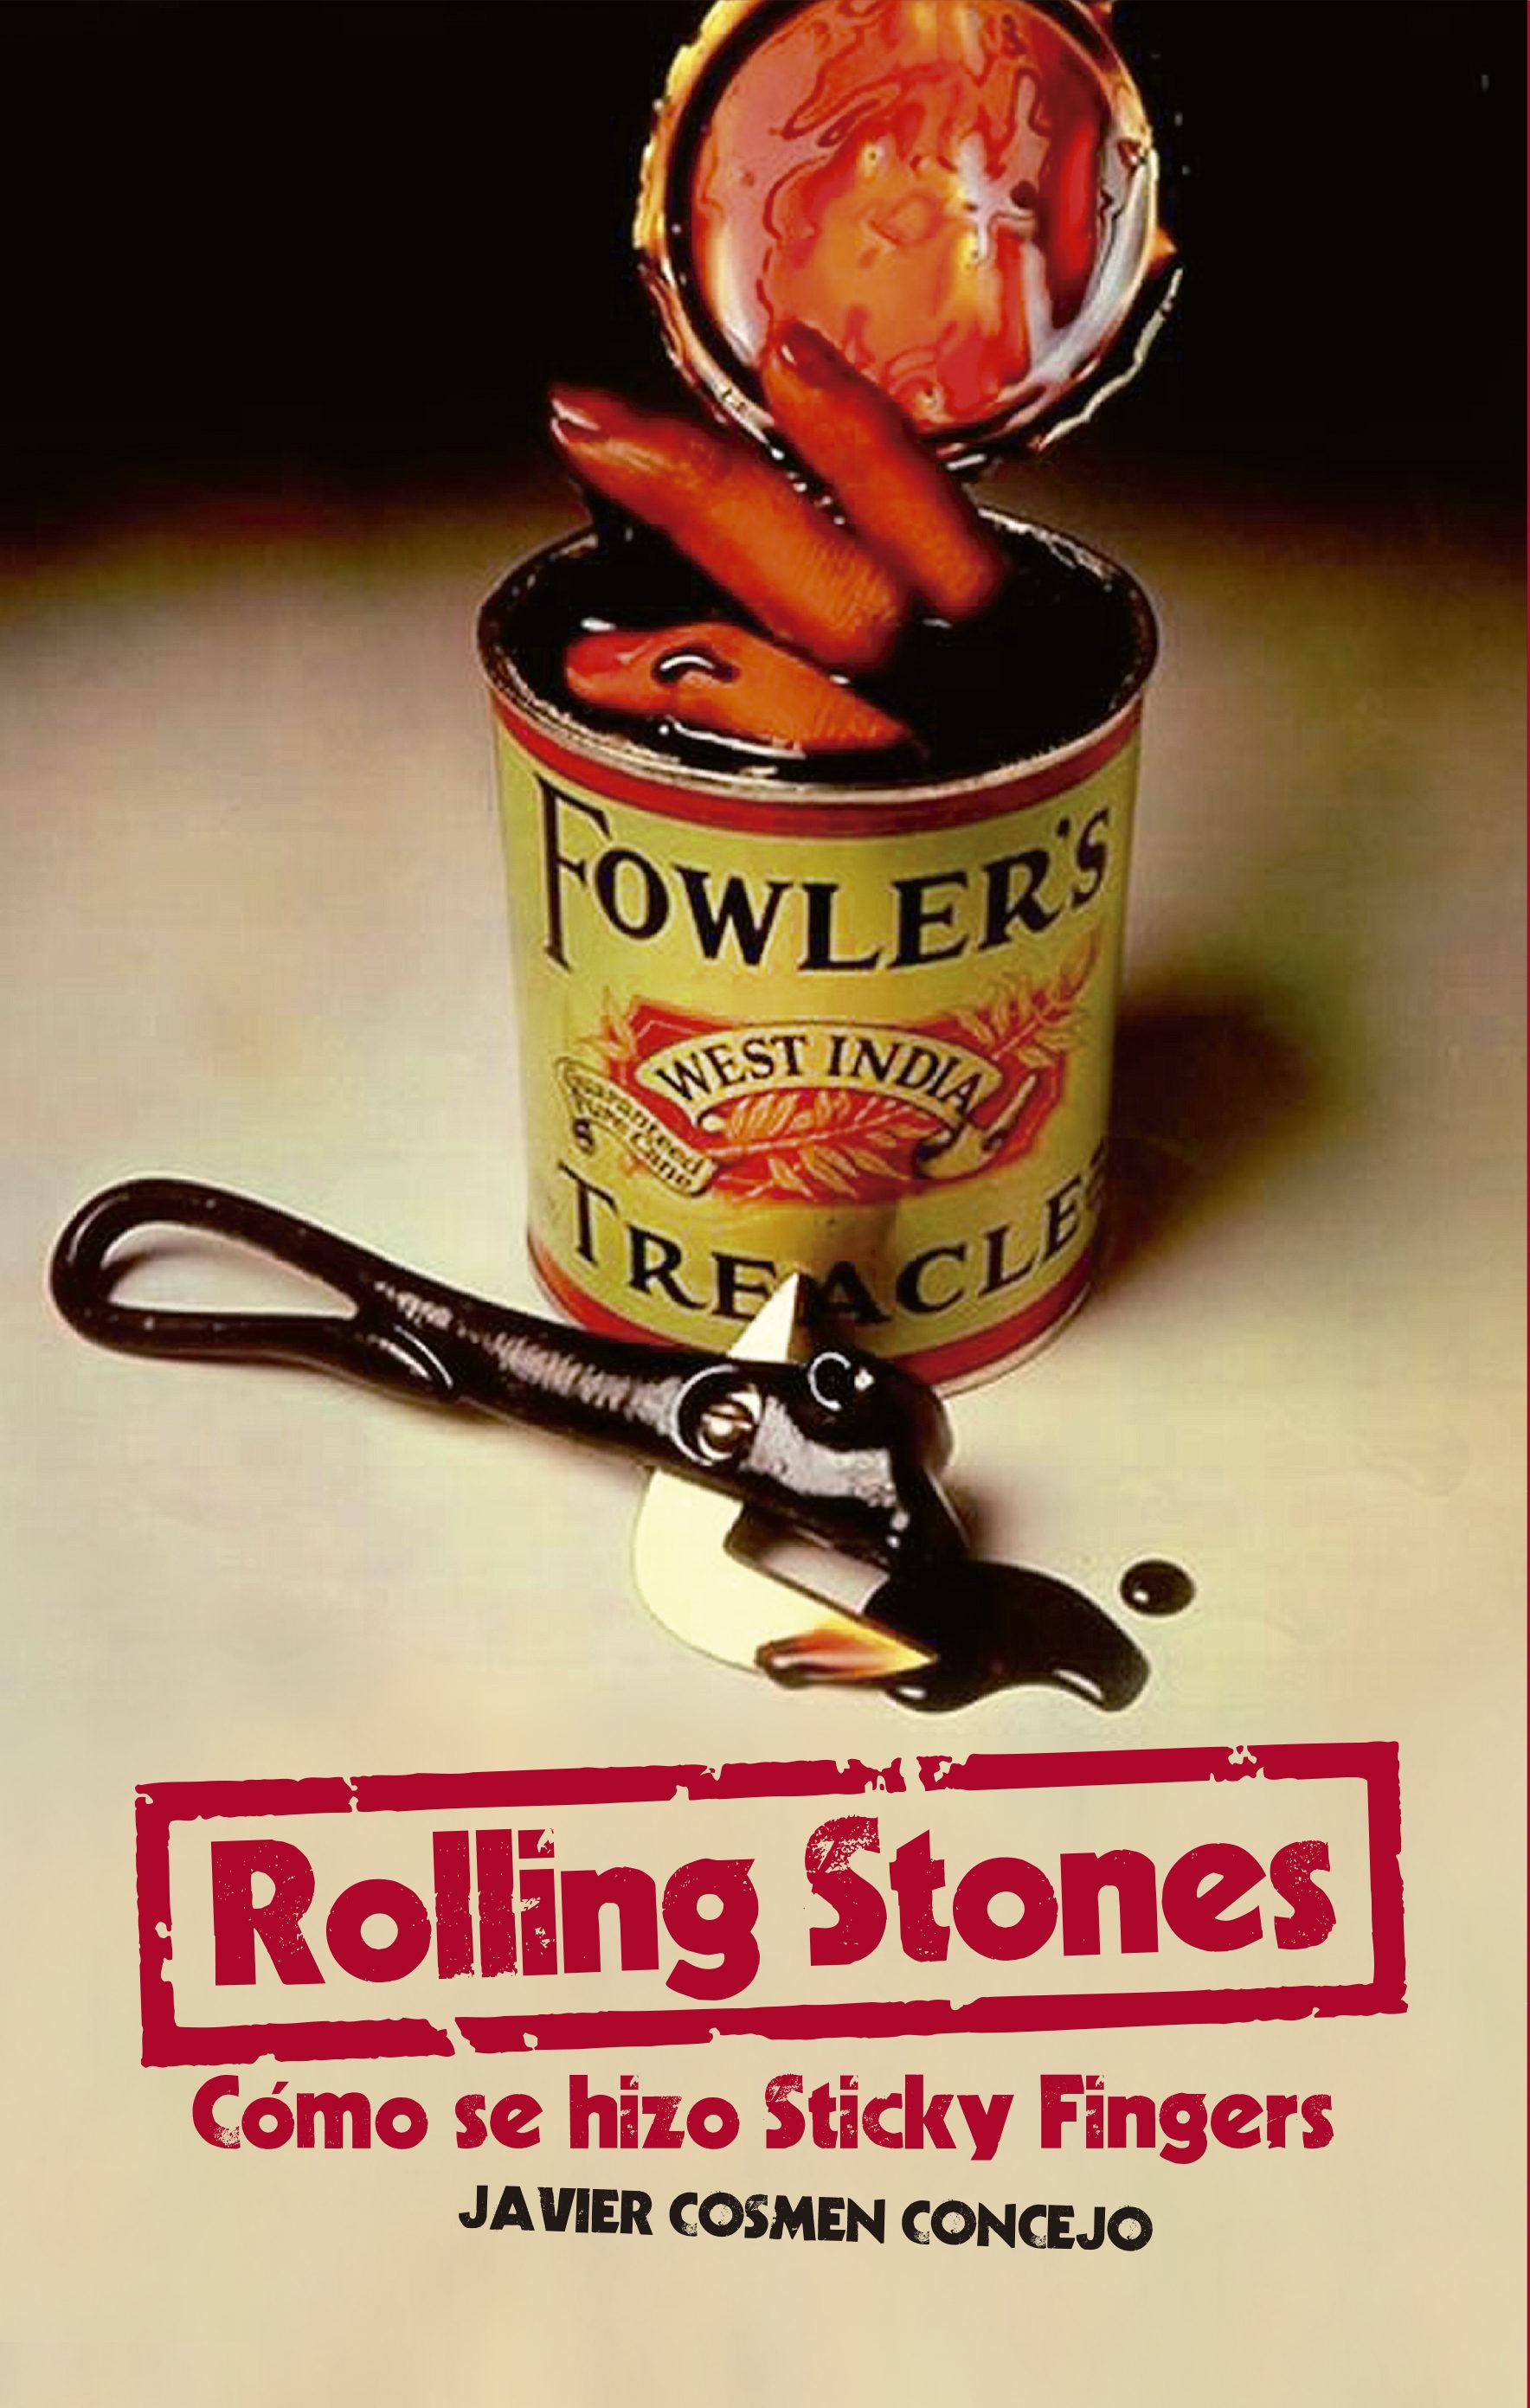 Rolling Stones. Cómo se hizo Sticky Fingers – 16,00€